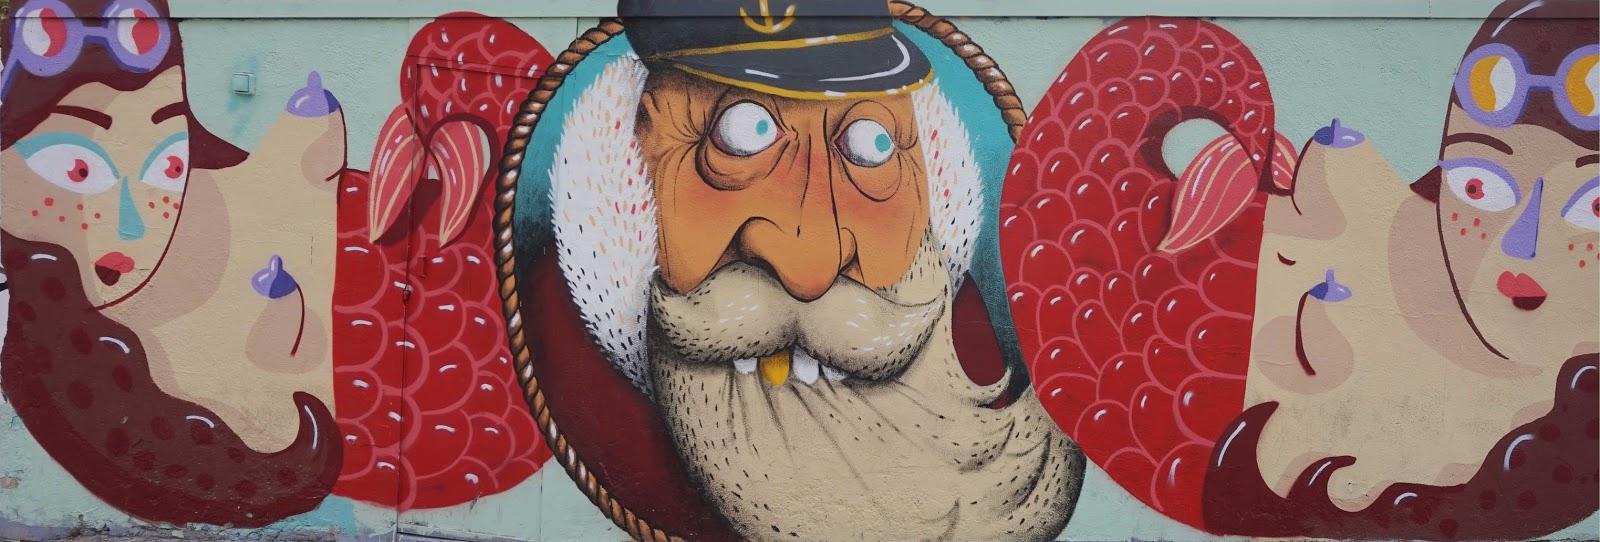 Barcelona Street Art - Sailor and mermaids